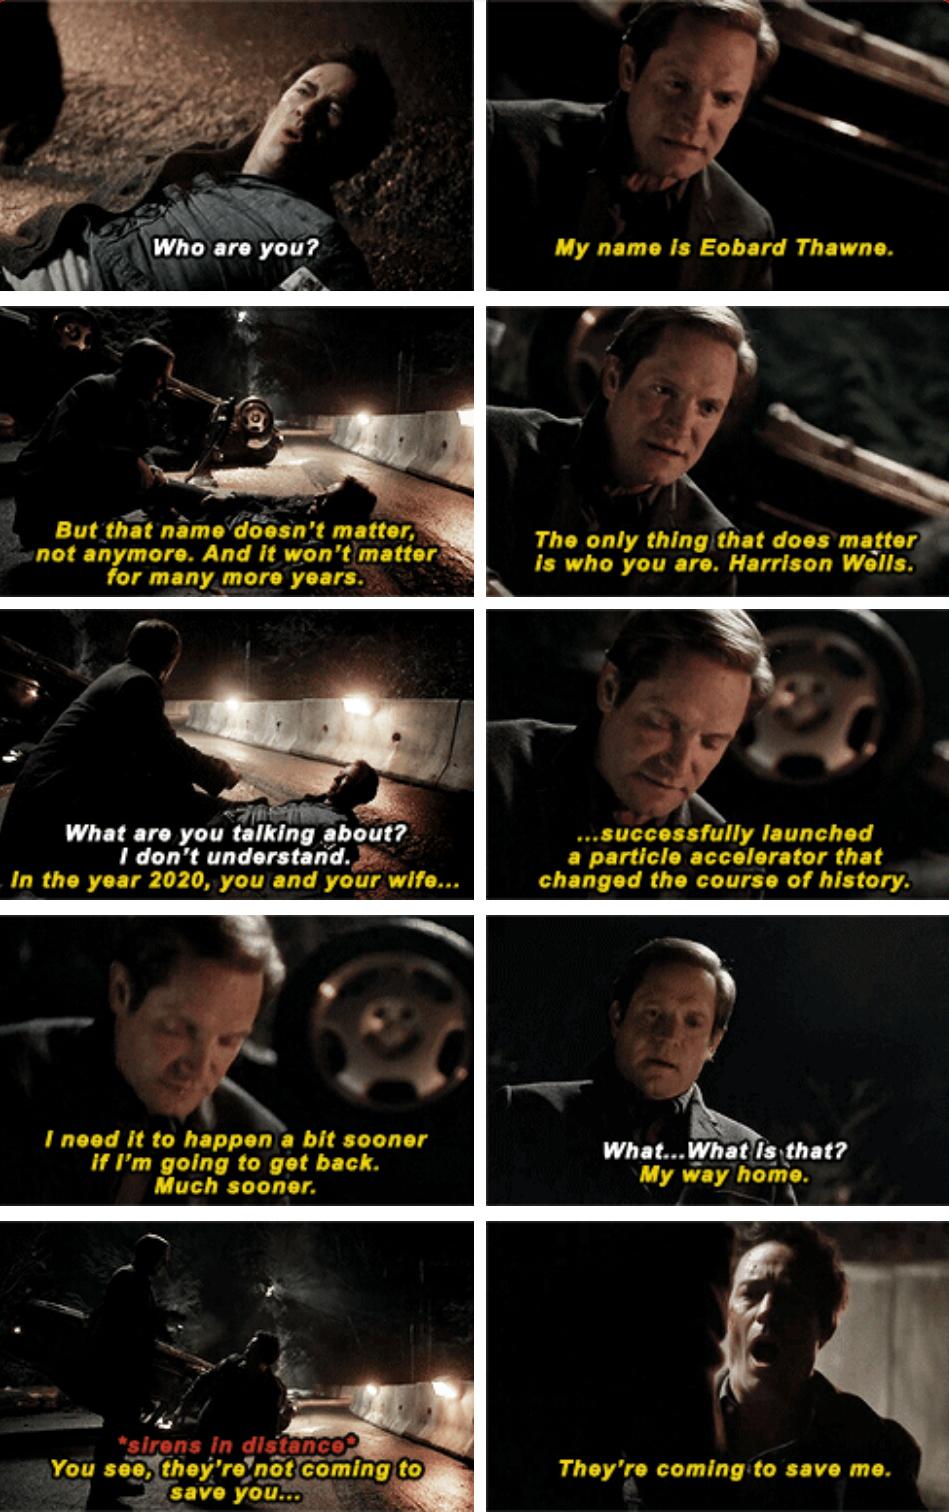 The Flash - Harrison Wells #1x17 #Season1